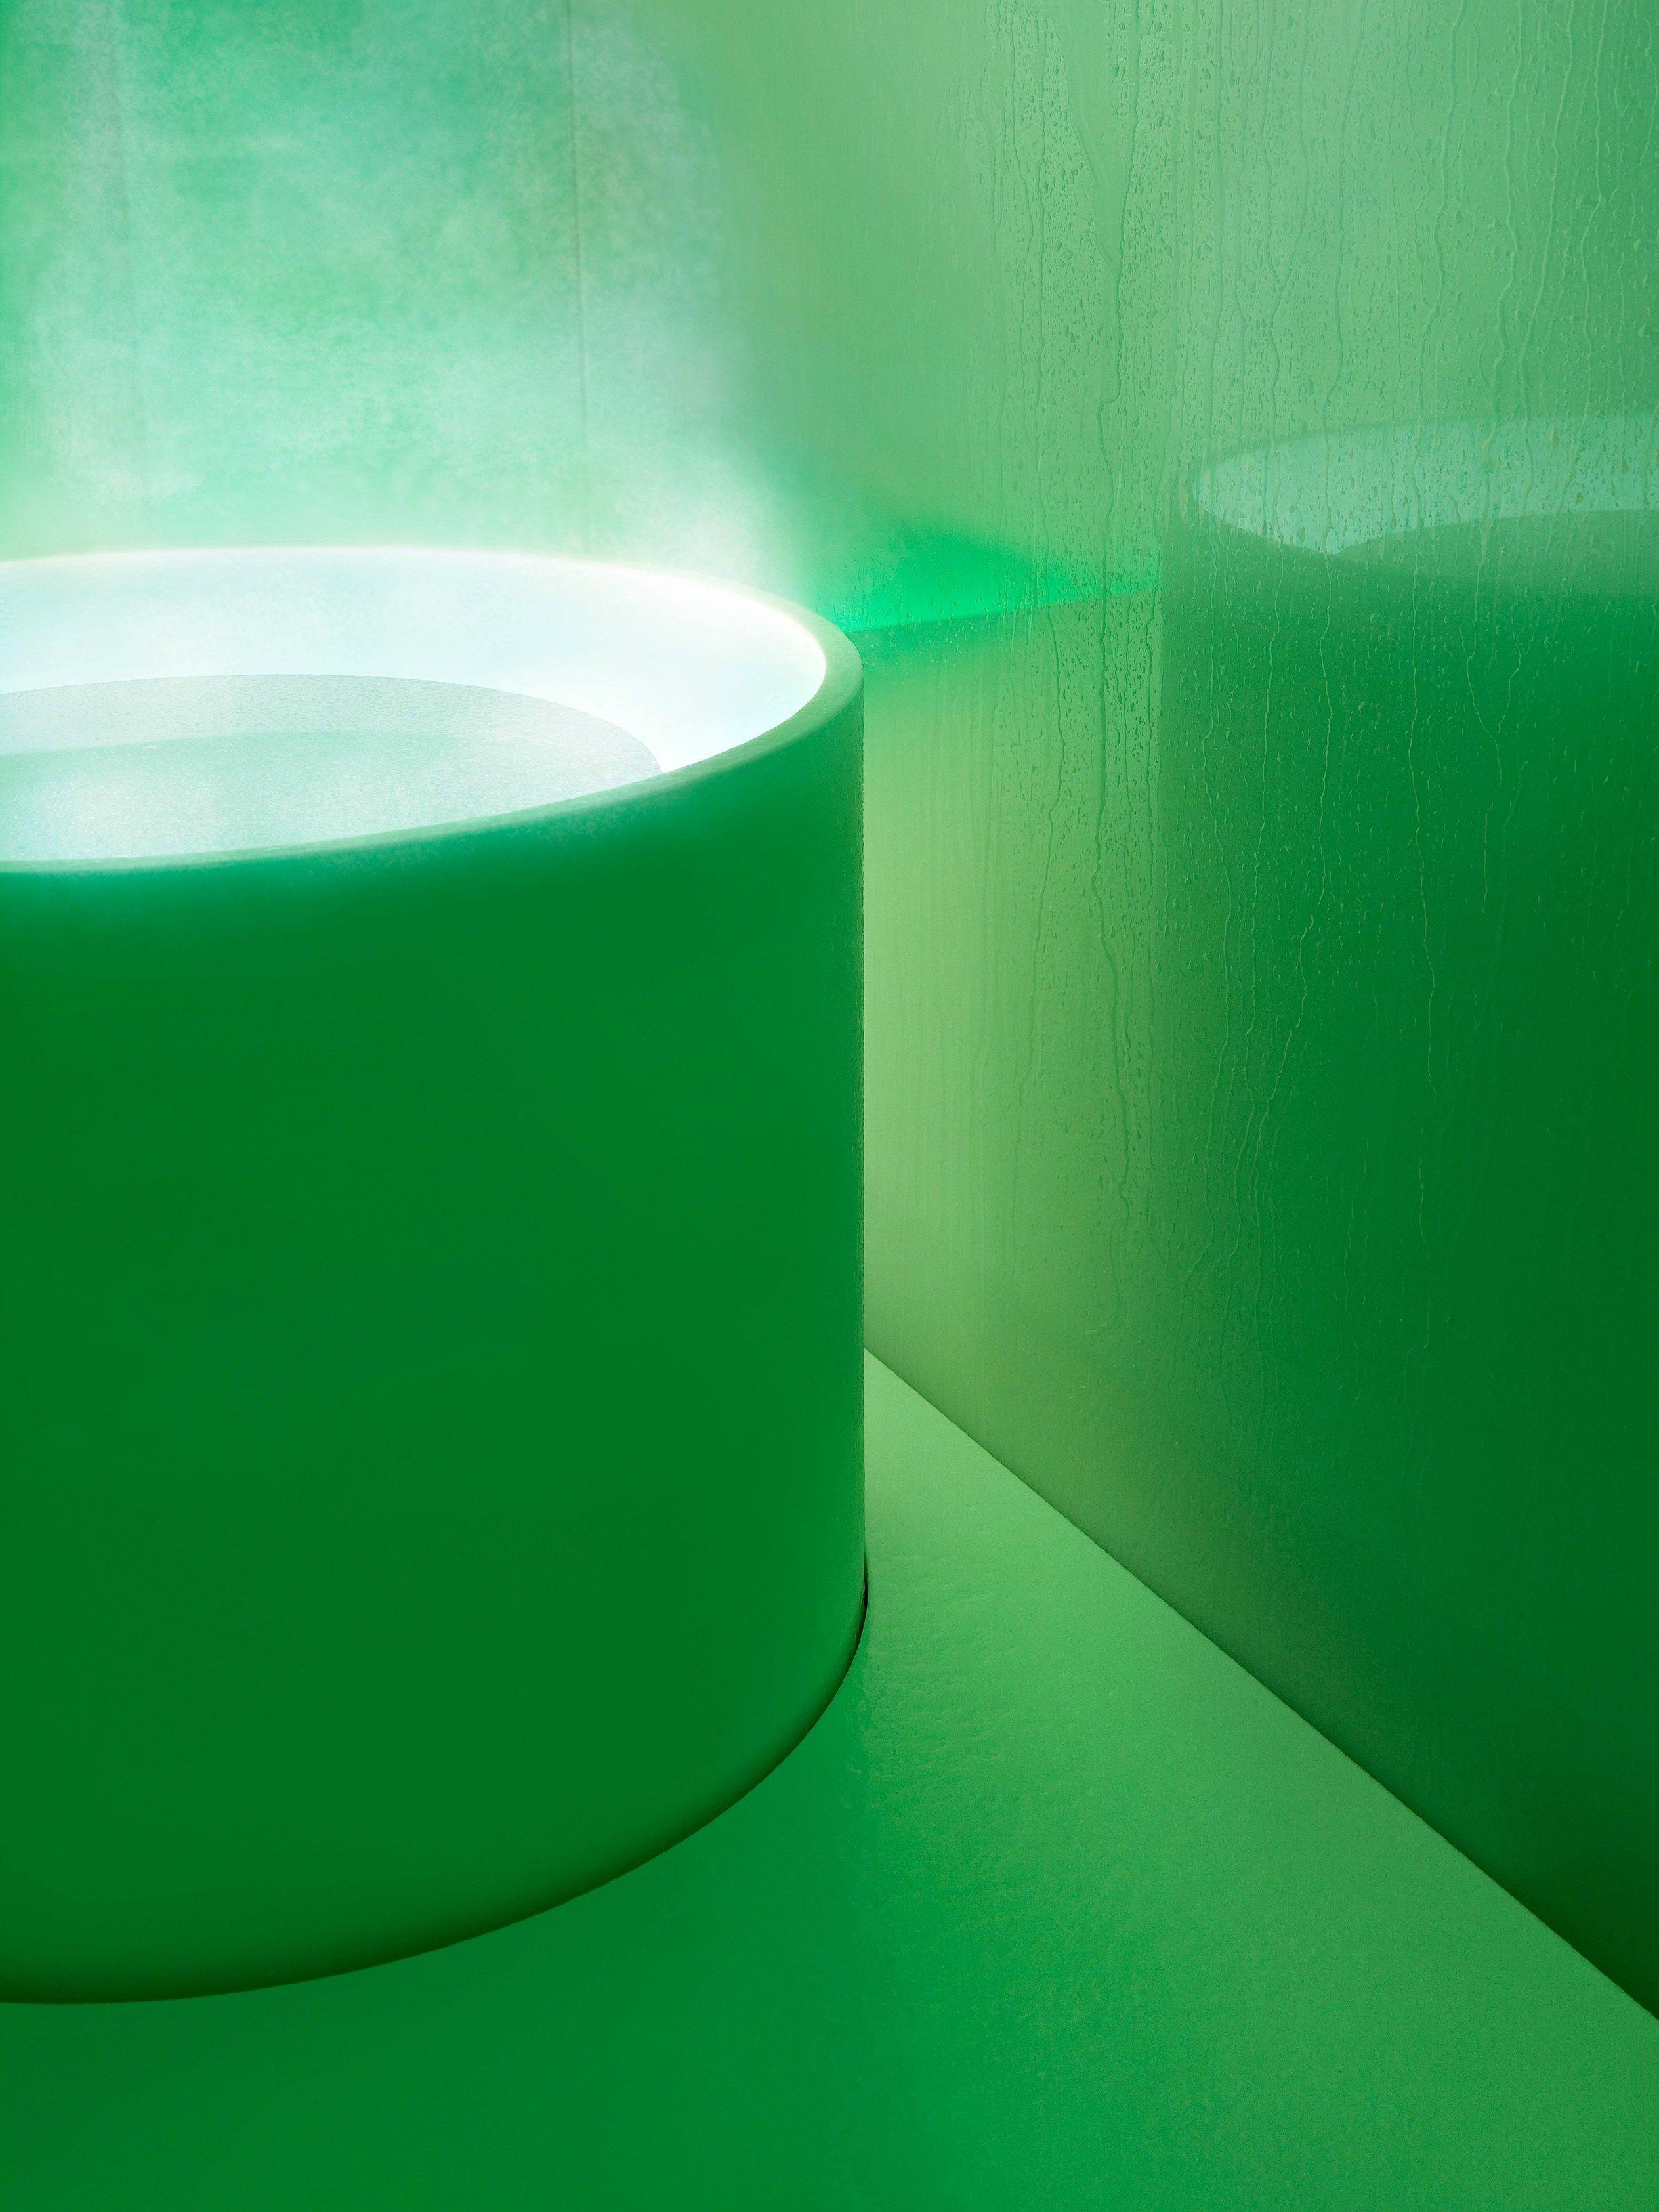 Ducha Con Baño Turco:Baño turco para cromoterapia con ducha SWEET STEAM PRO by STARPOOL